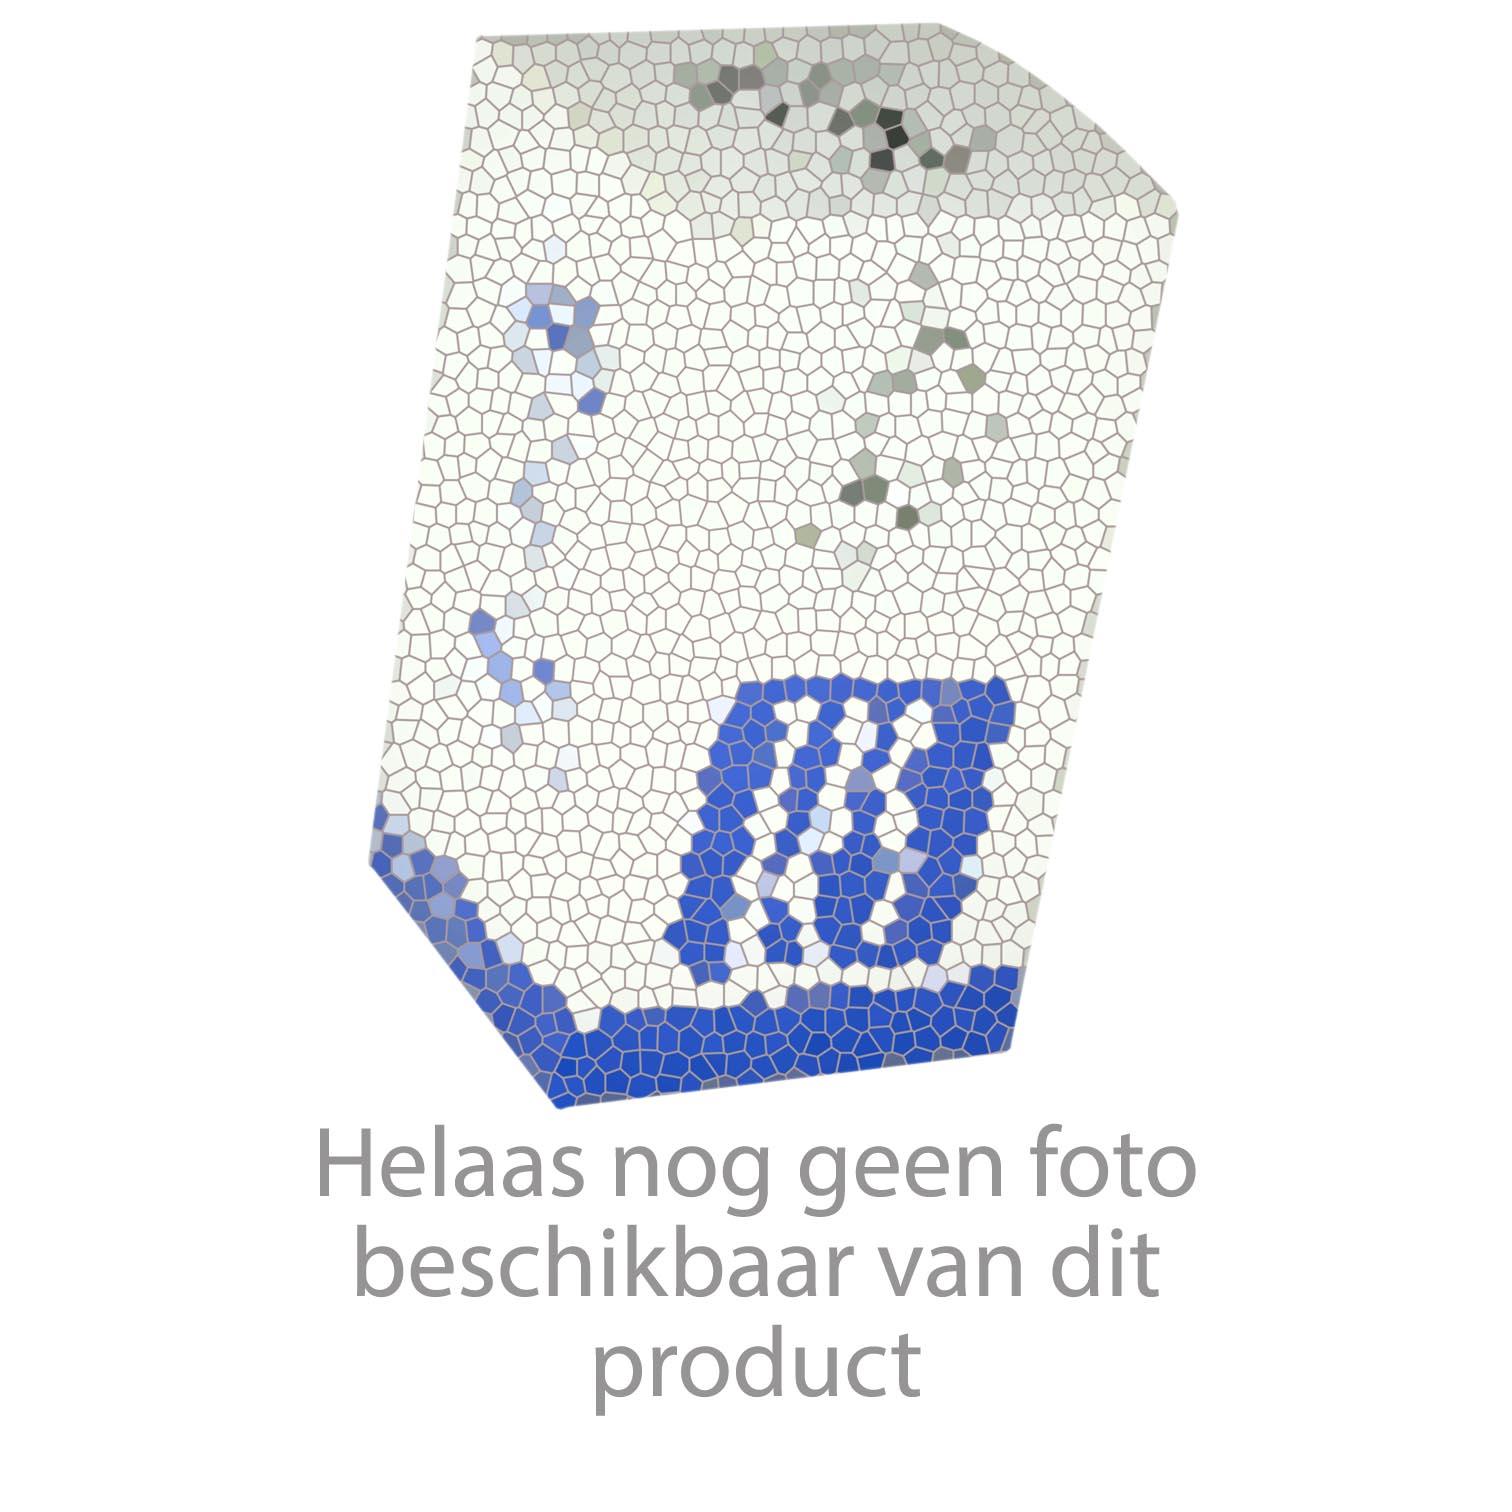 Grohe onderdelen Allure Brilliant Wastafelmengkraan M/Waste 23029000